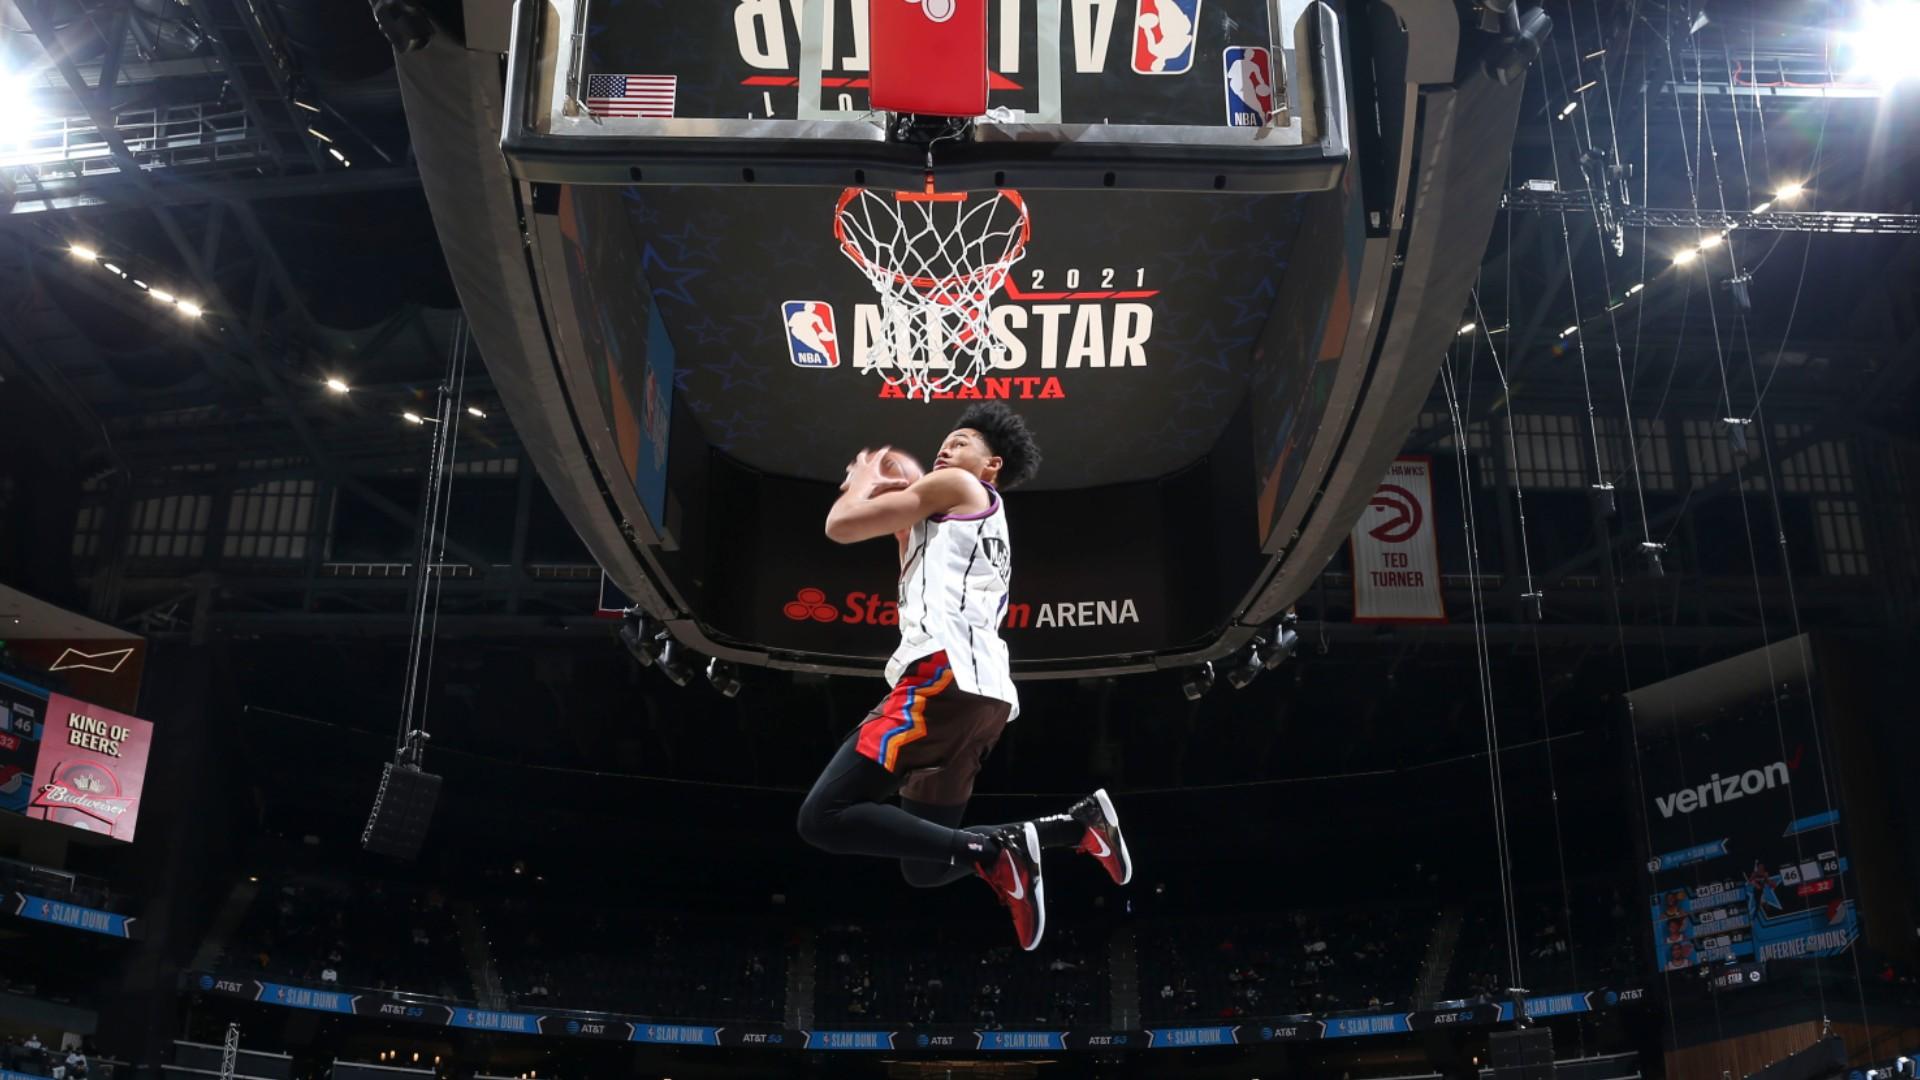 All-Star Game: Trail Blazers' Simons wins Slam Dunk Contest